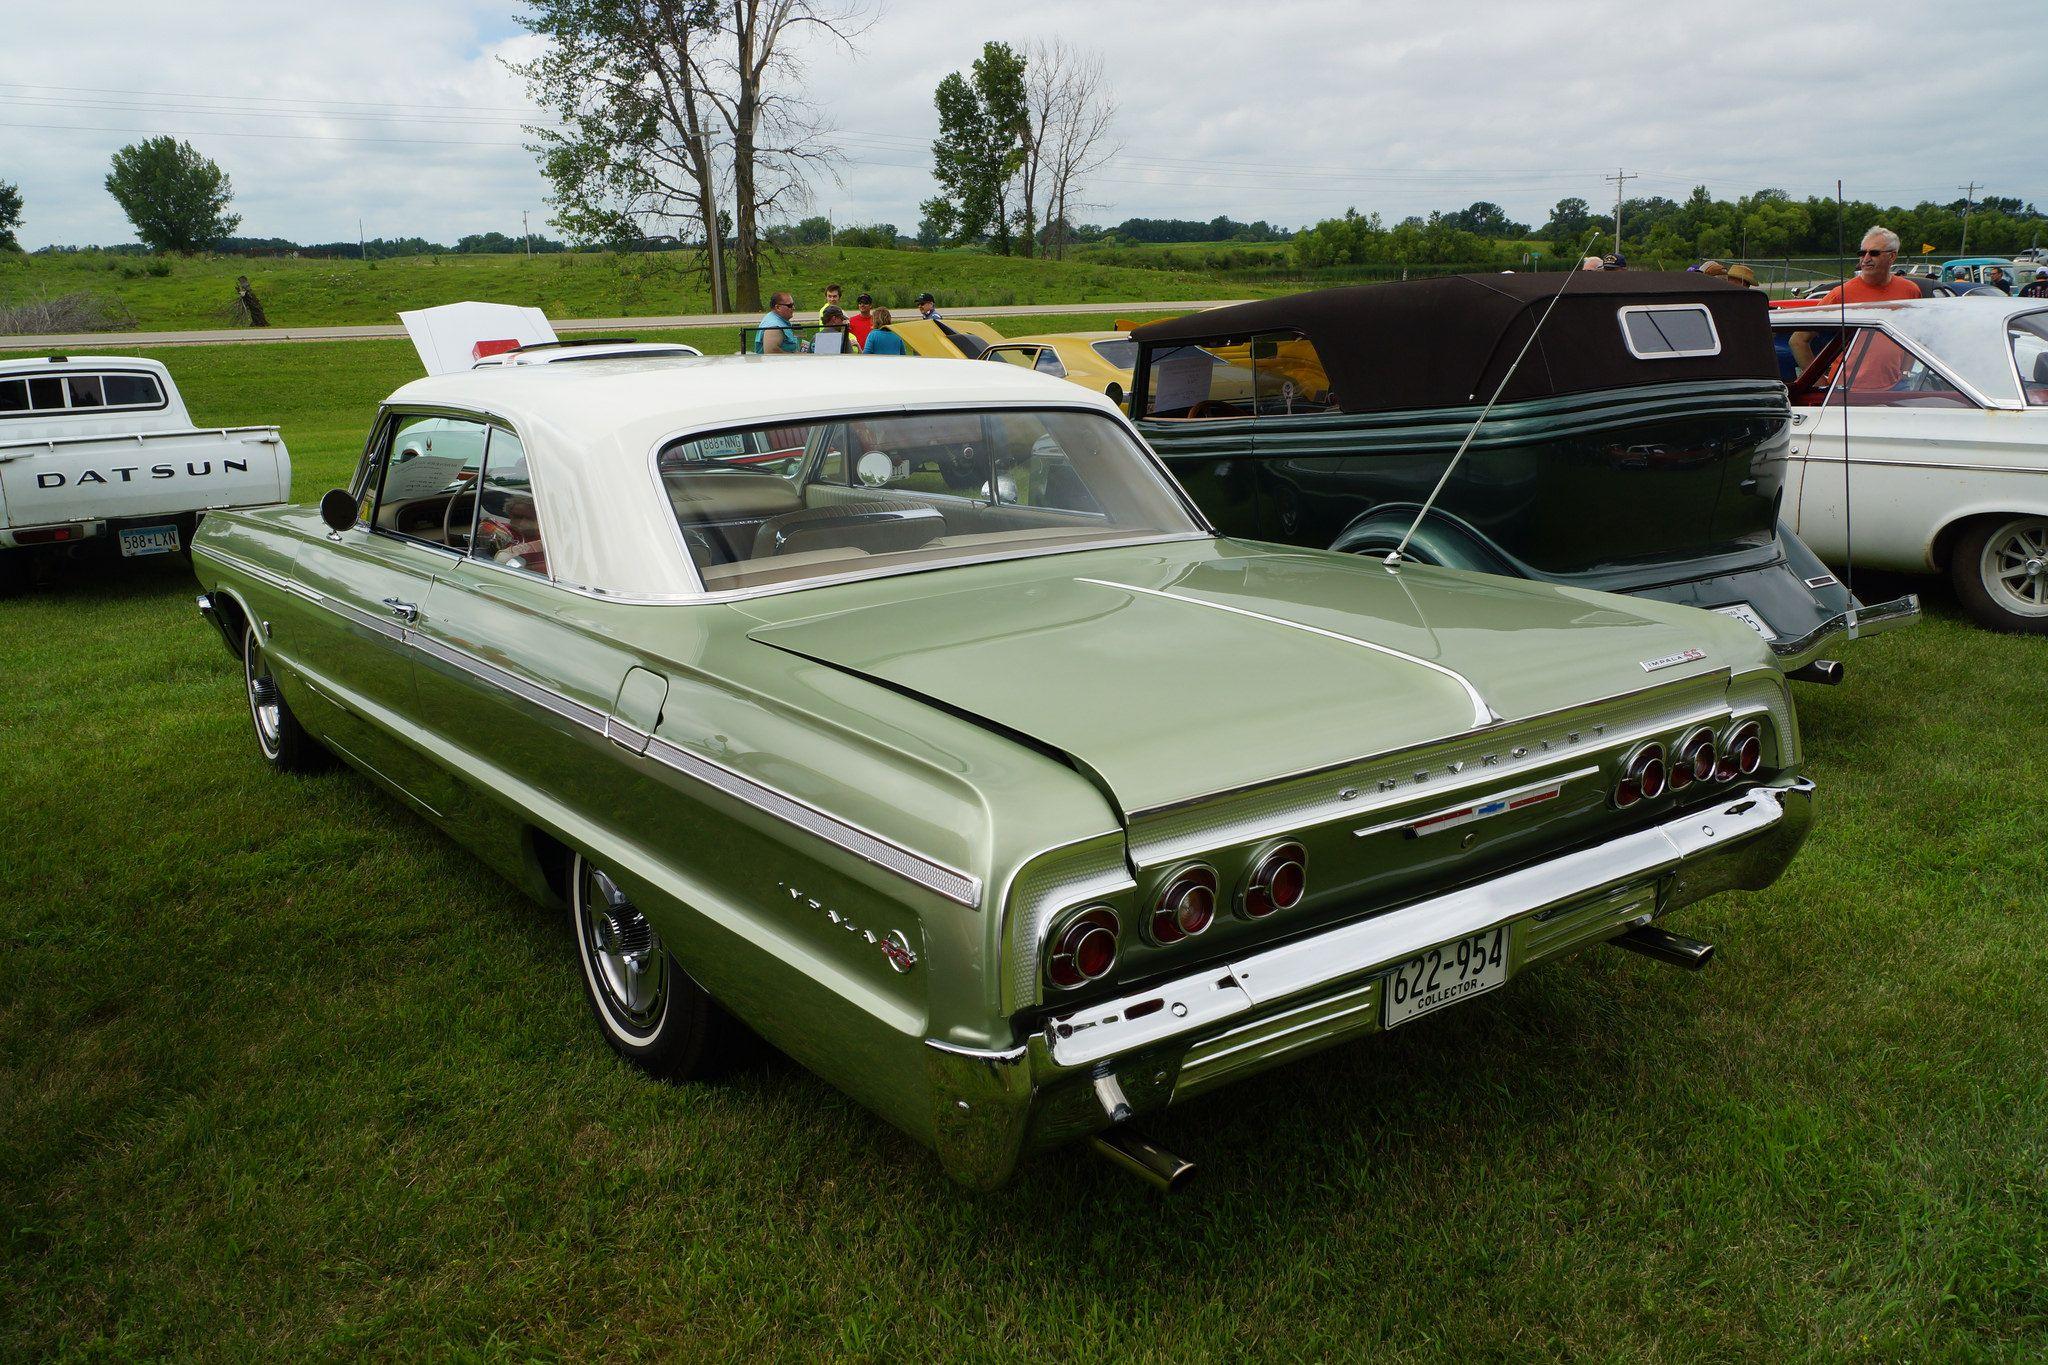 Cars and more chevy impala chevy impalas vehicles drag racing racing - 1964 Chevrolet Impala Ss